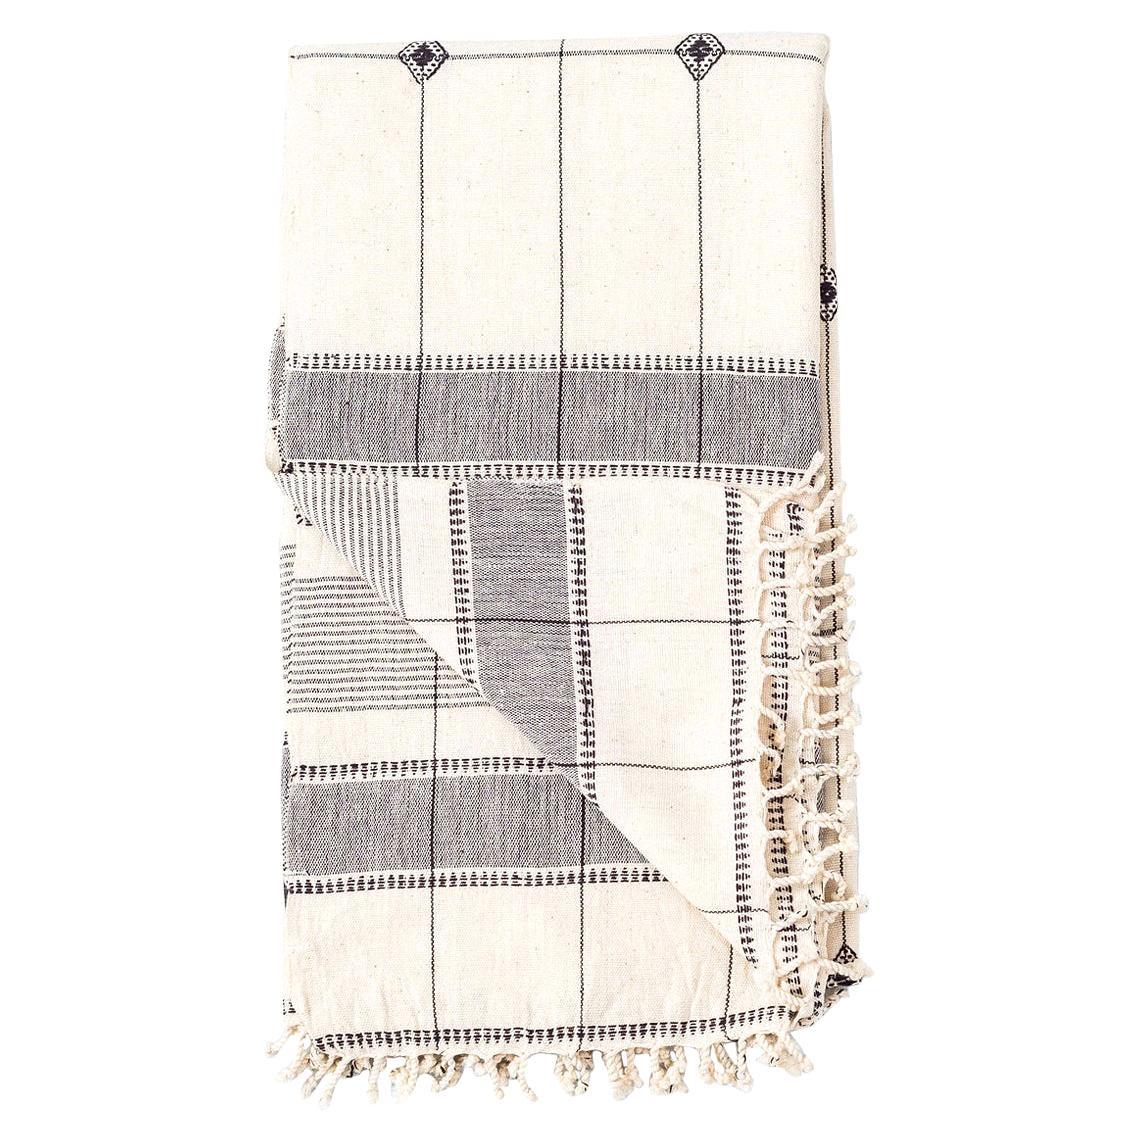 Mool Handloom King Size Bedpsread Coverlet Black & White, in Organic Cotton